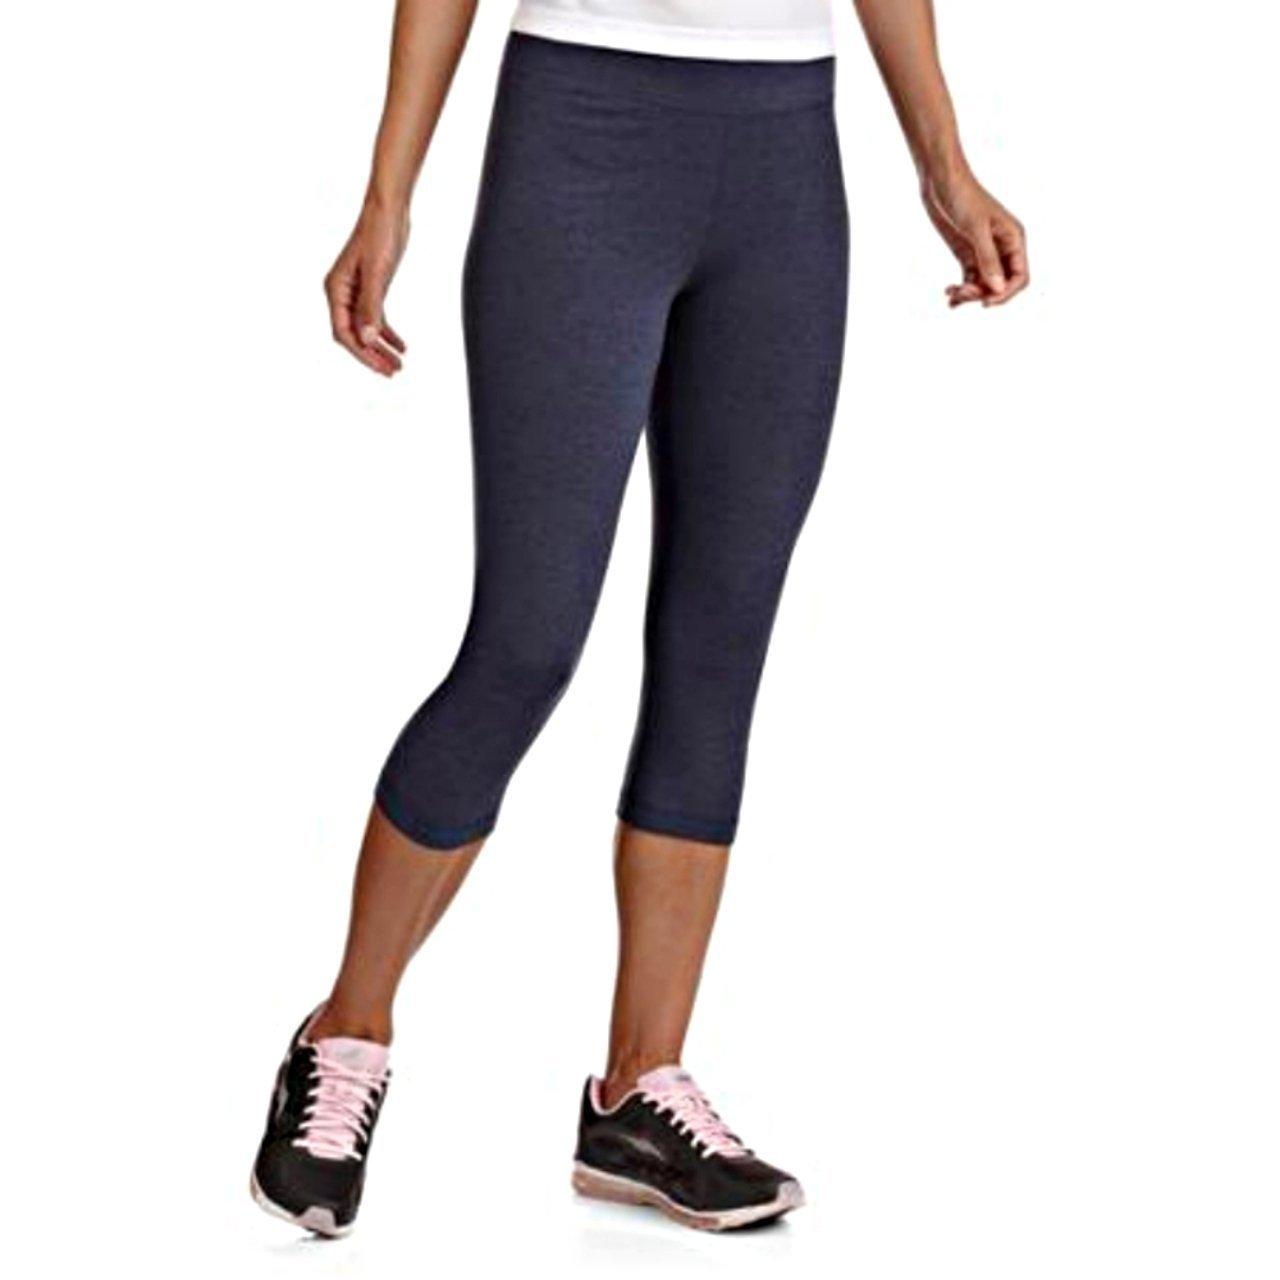 b99b4ca95cd Danskin Now Womens Dri-More Cropped Leggings at Amazon Women s Clothing  store